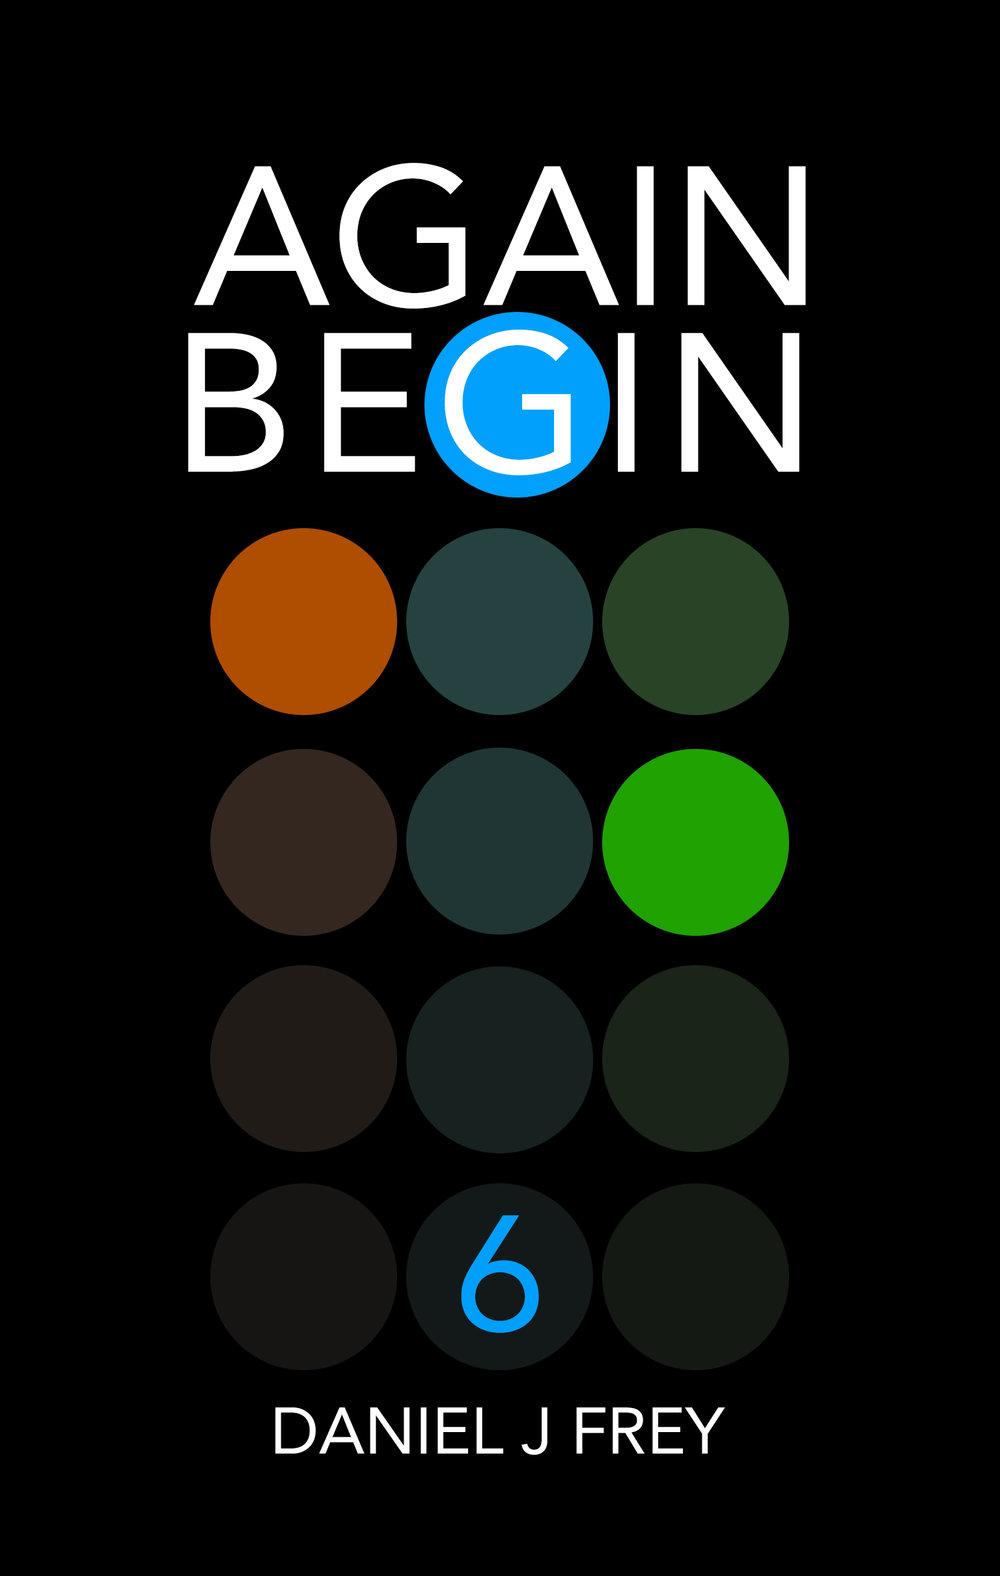 Again Begin 6 - Plans